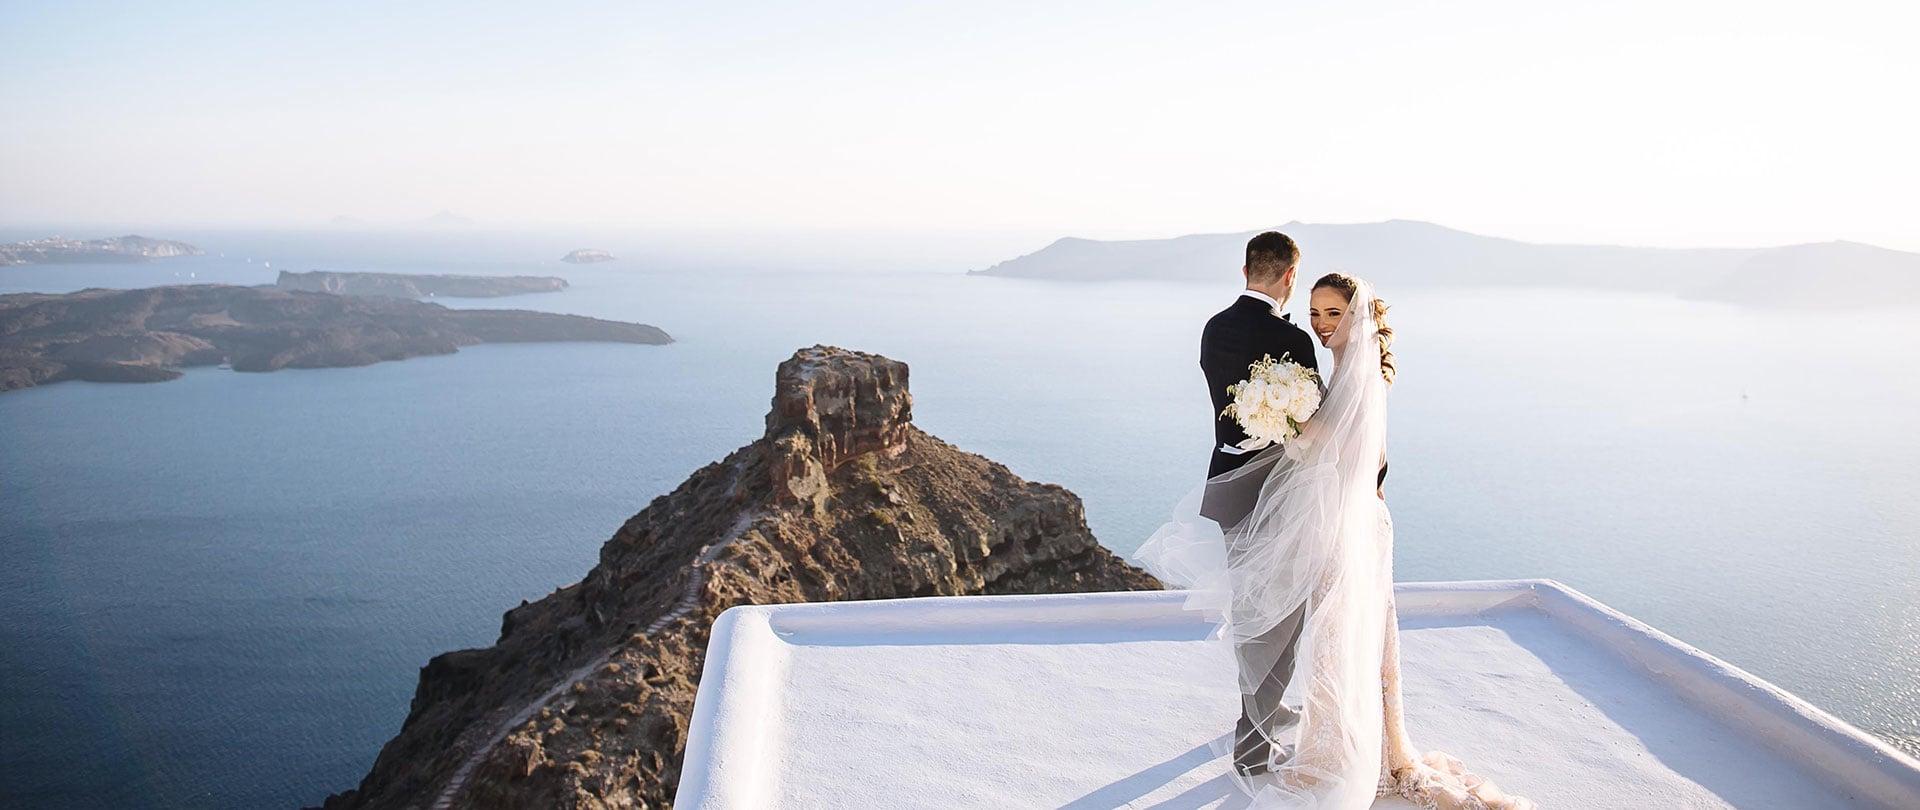 Victoria & Tim Wedding Video Filmed at Santorini, Greece